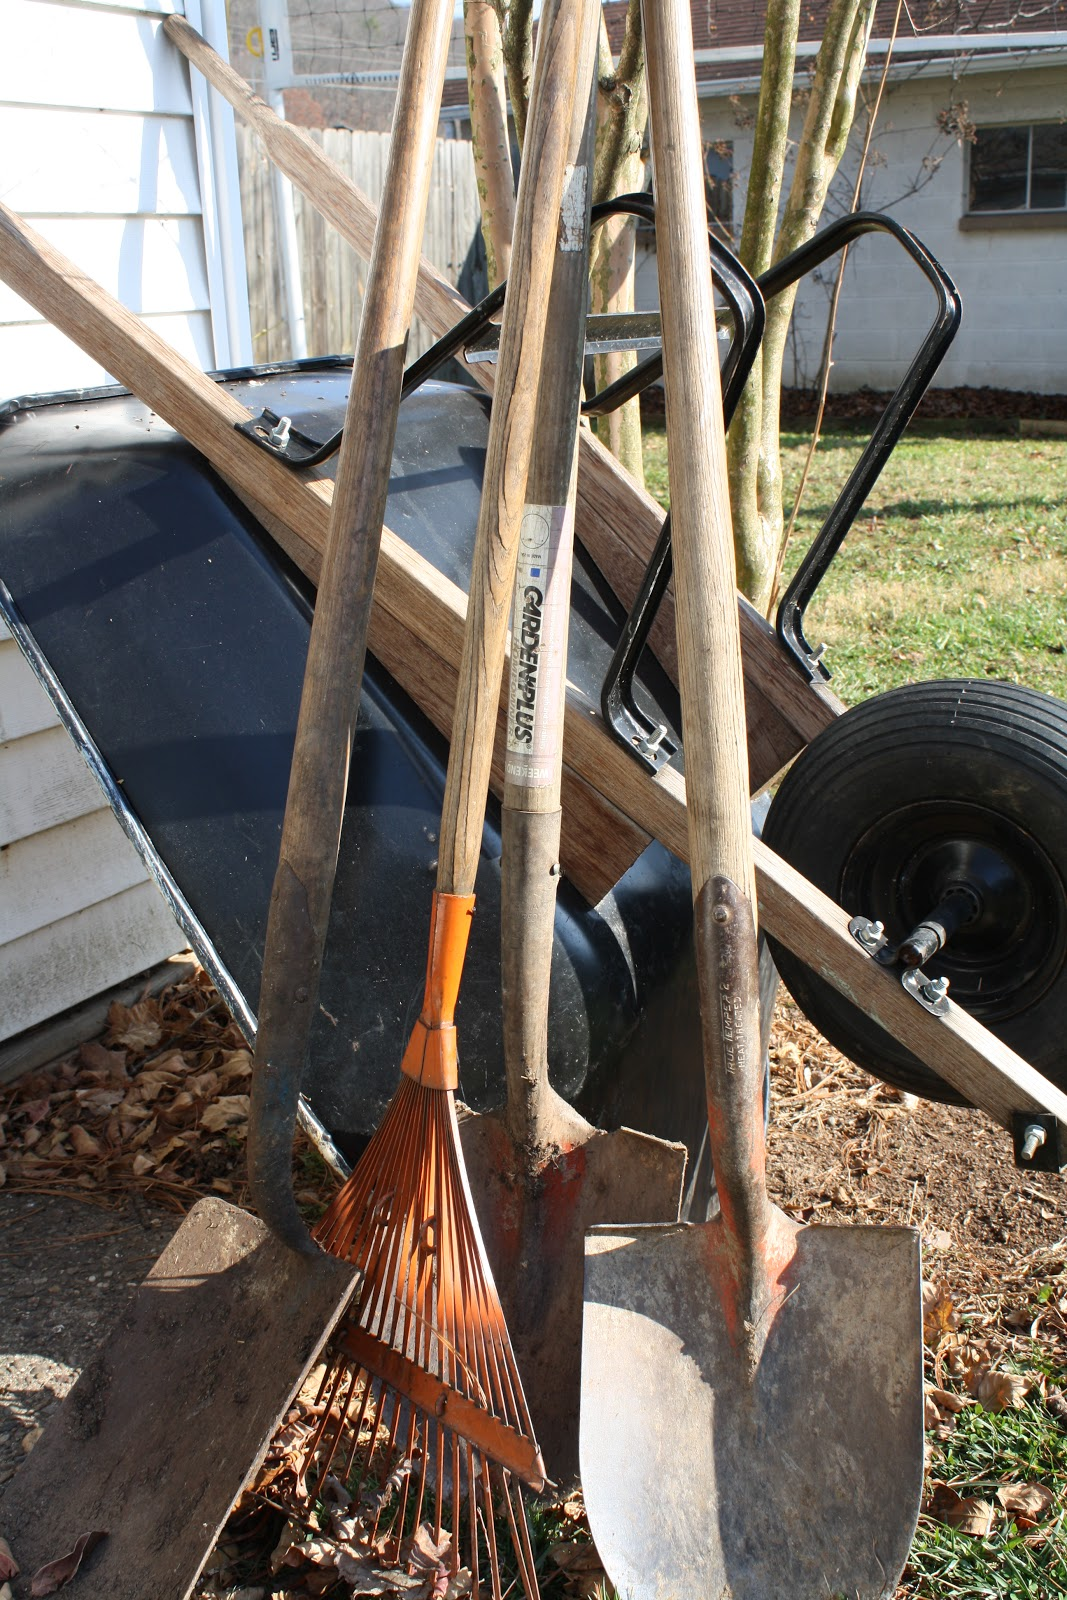 The redeemed gardener garden tool maintenance 101 for Garden tool maintenance